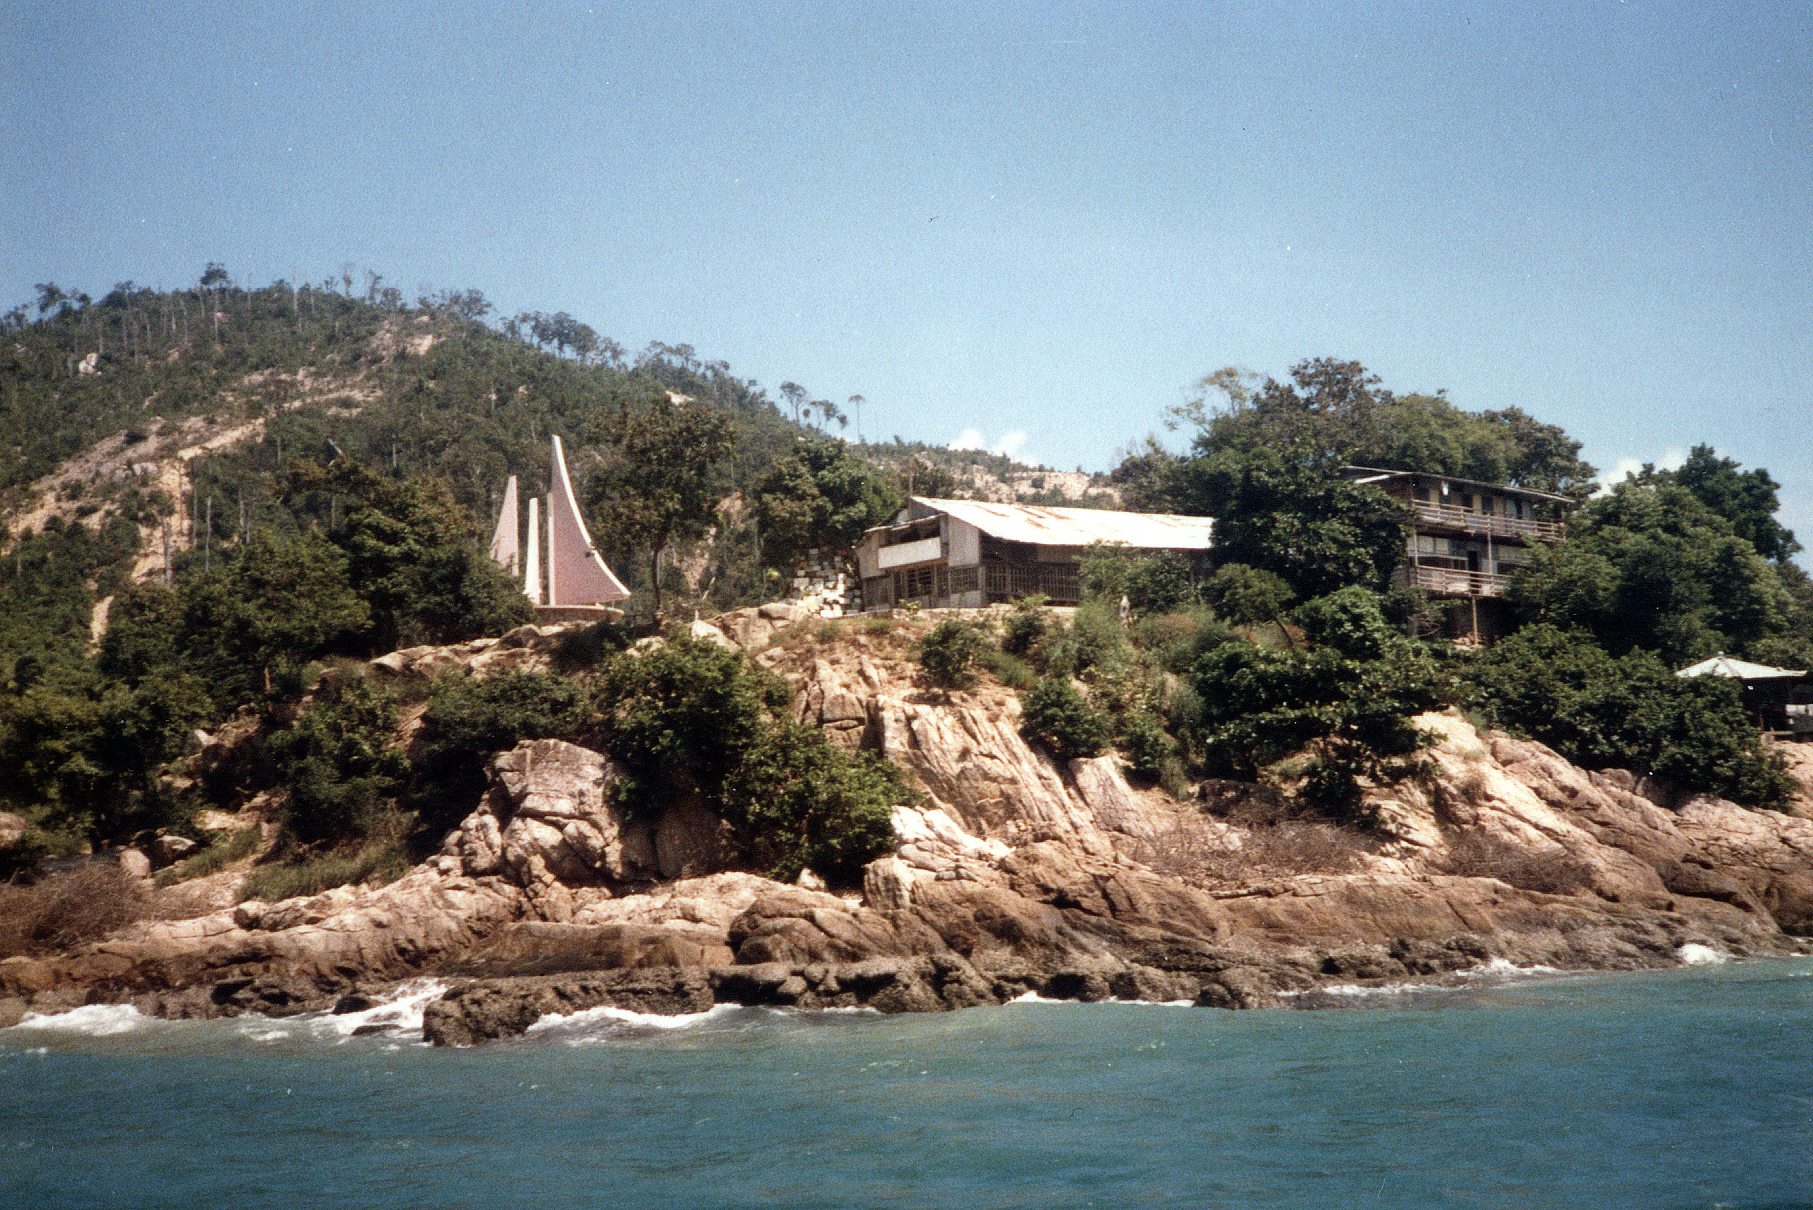 Pulau Bidong Refugee Camp